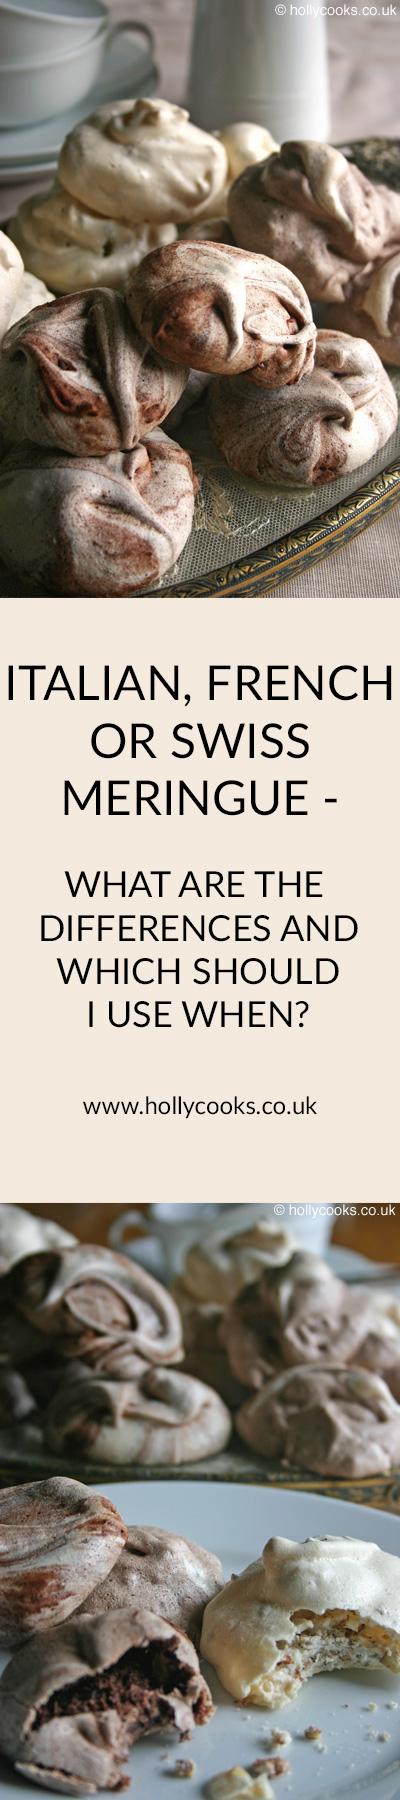 Italian, French or Swiss meringue